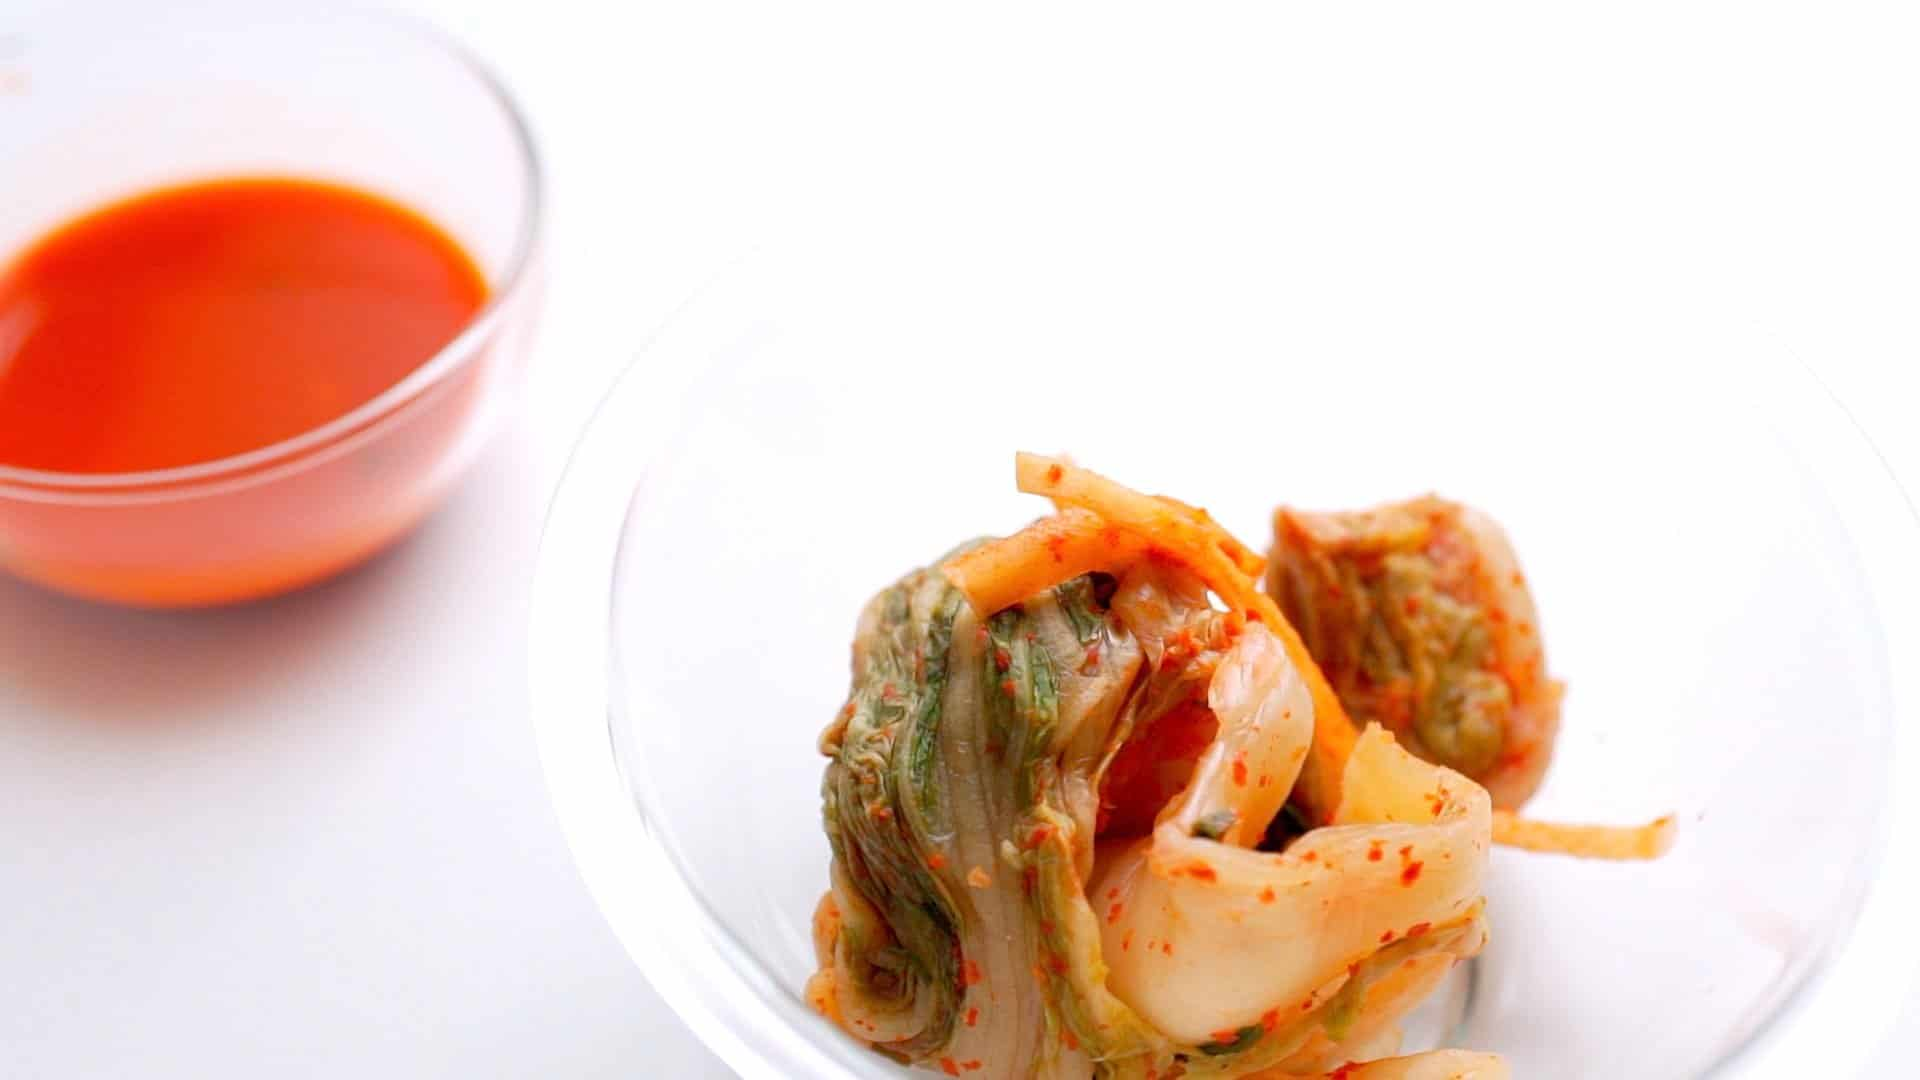 Kimchi and kimchi juice separated for making kimchi fried rice.